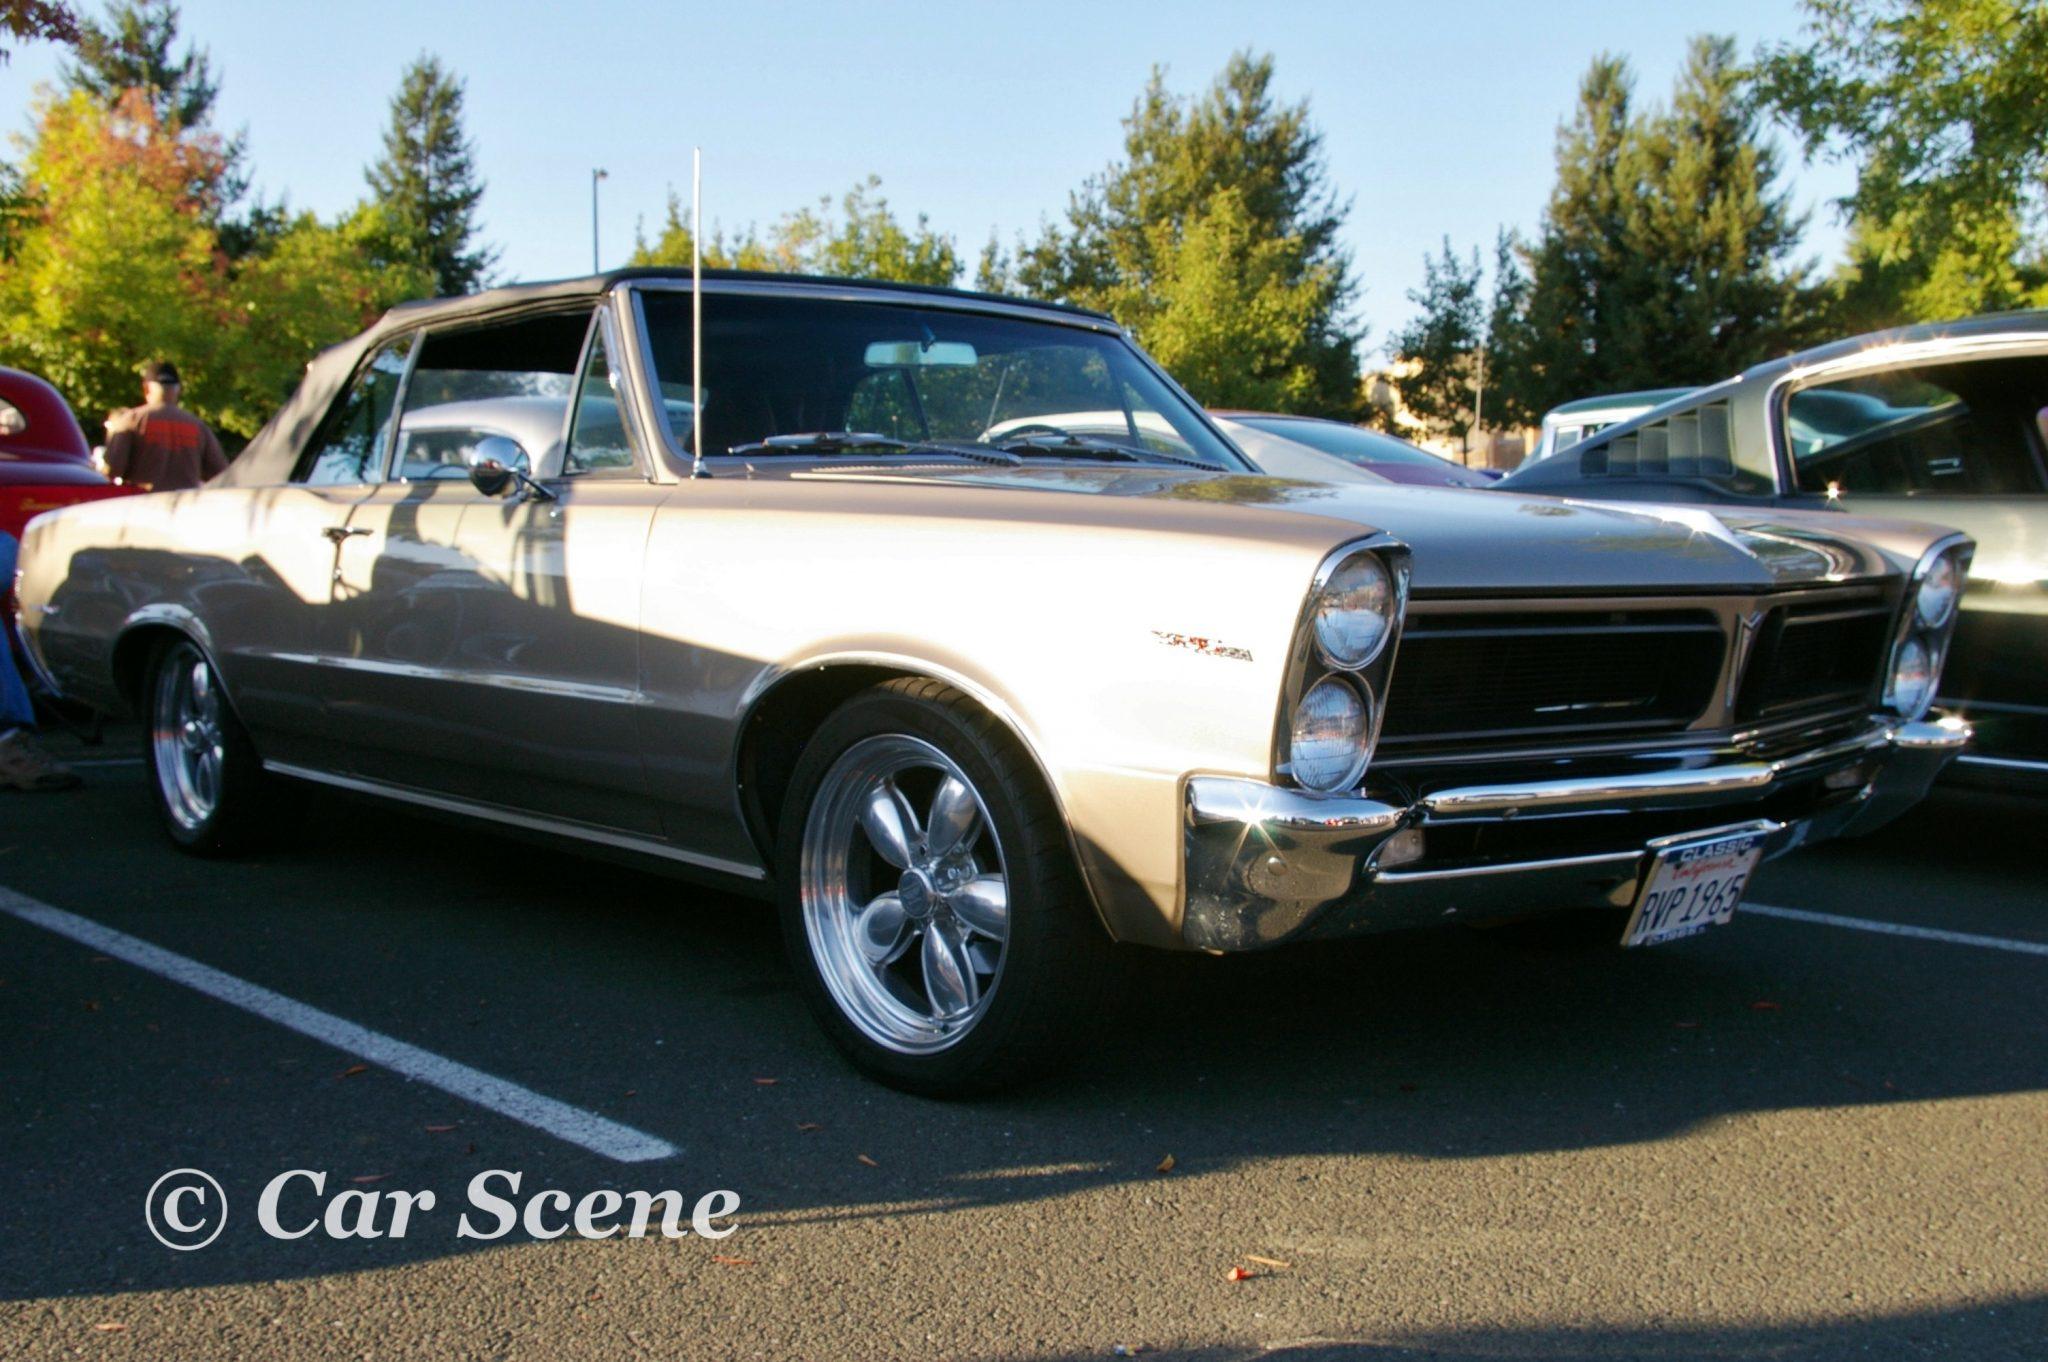 1965 Pontiac tempest Convertible front three quarters view